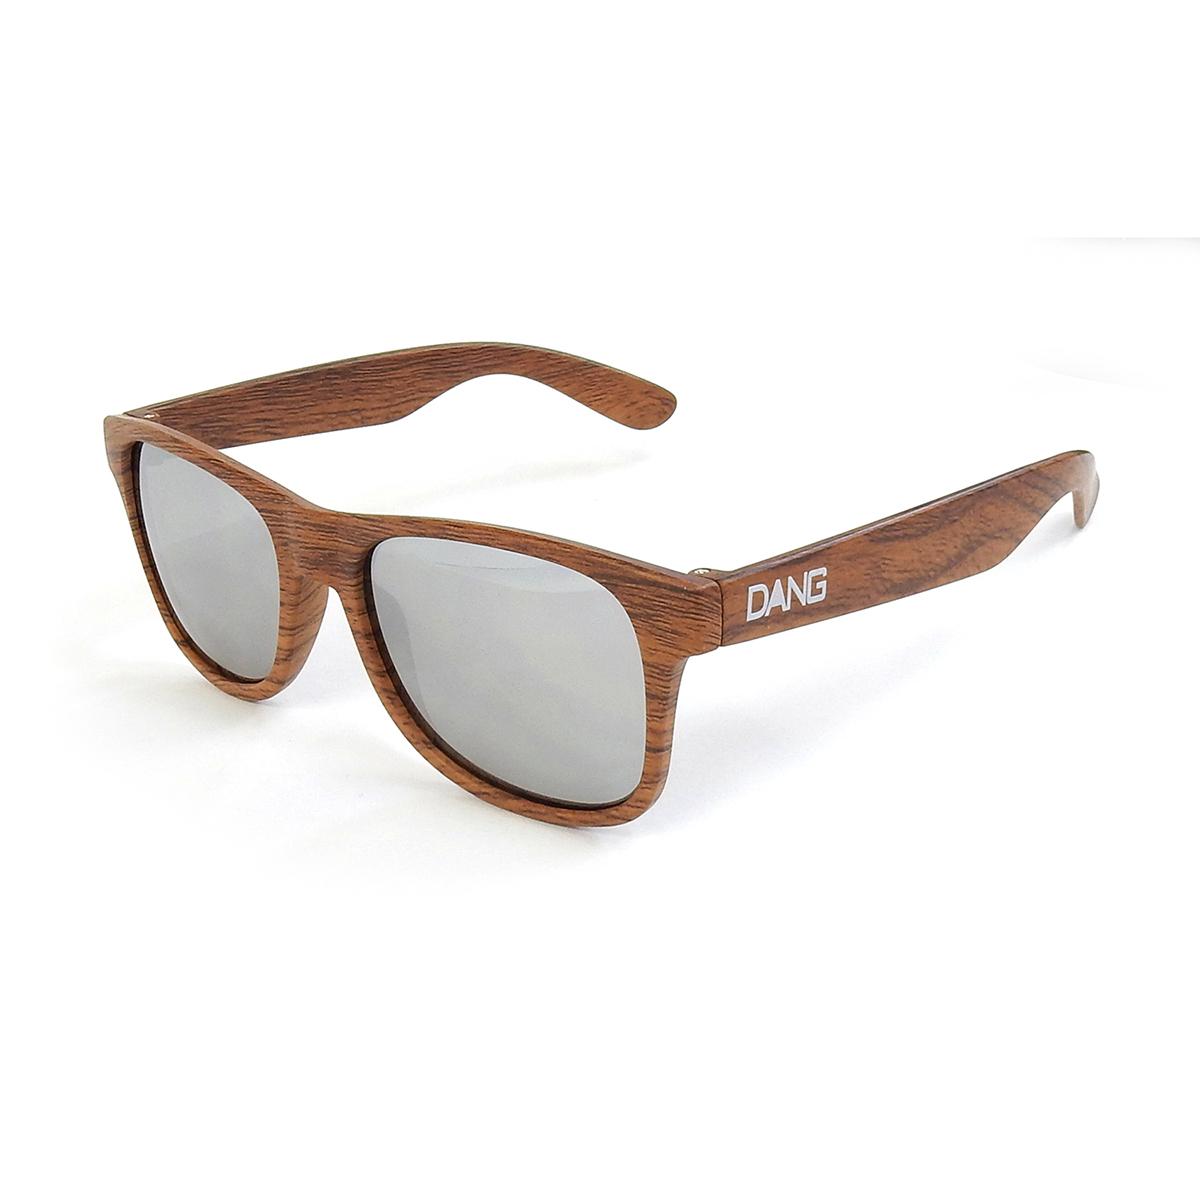 Dang Shades vidg00337 LOCO Wood Matte X Chrome Mirror サングラス